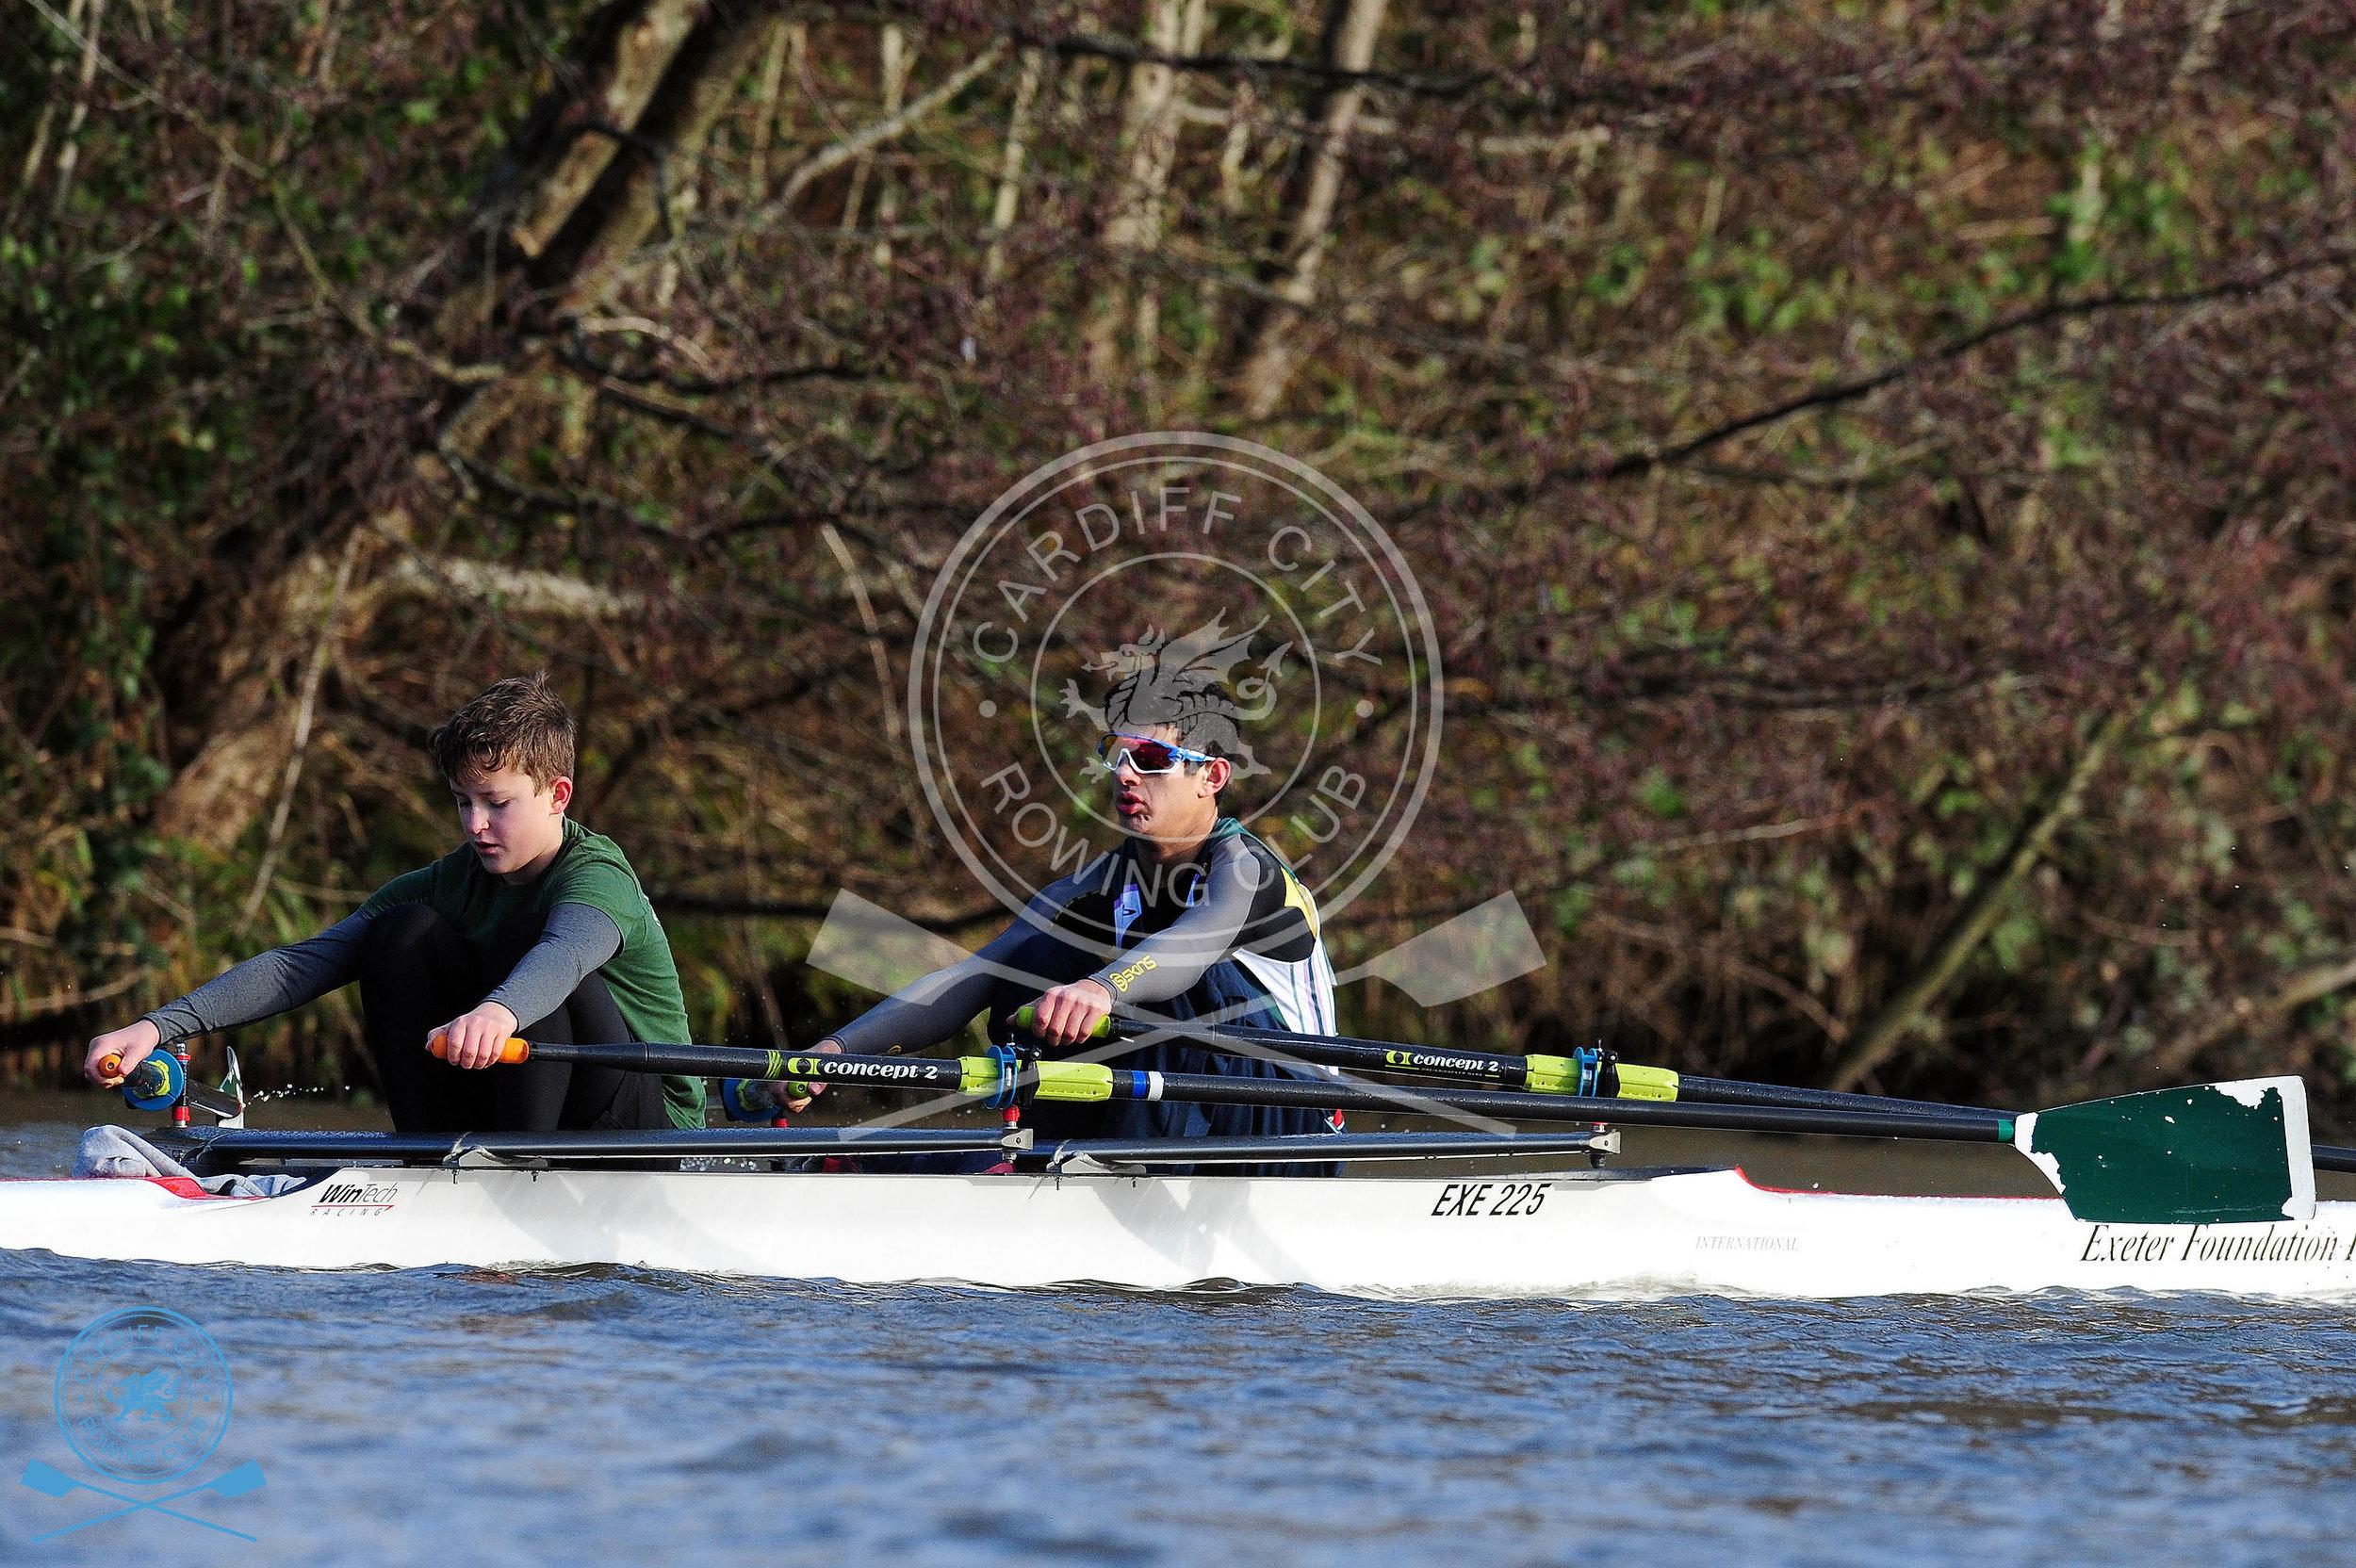 DW_280119_Cardiff_City_Rowing_328.jpg